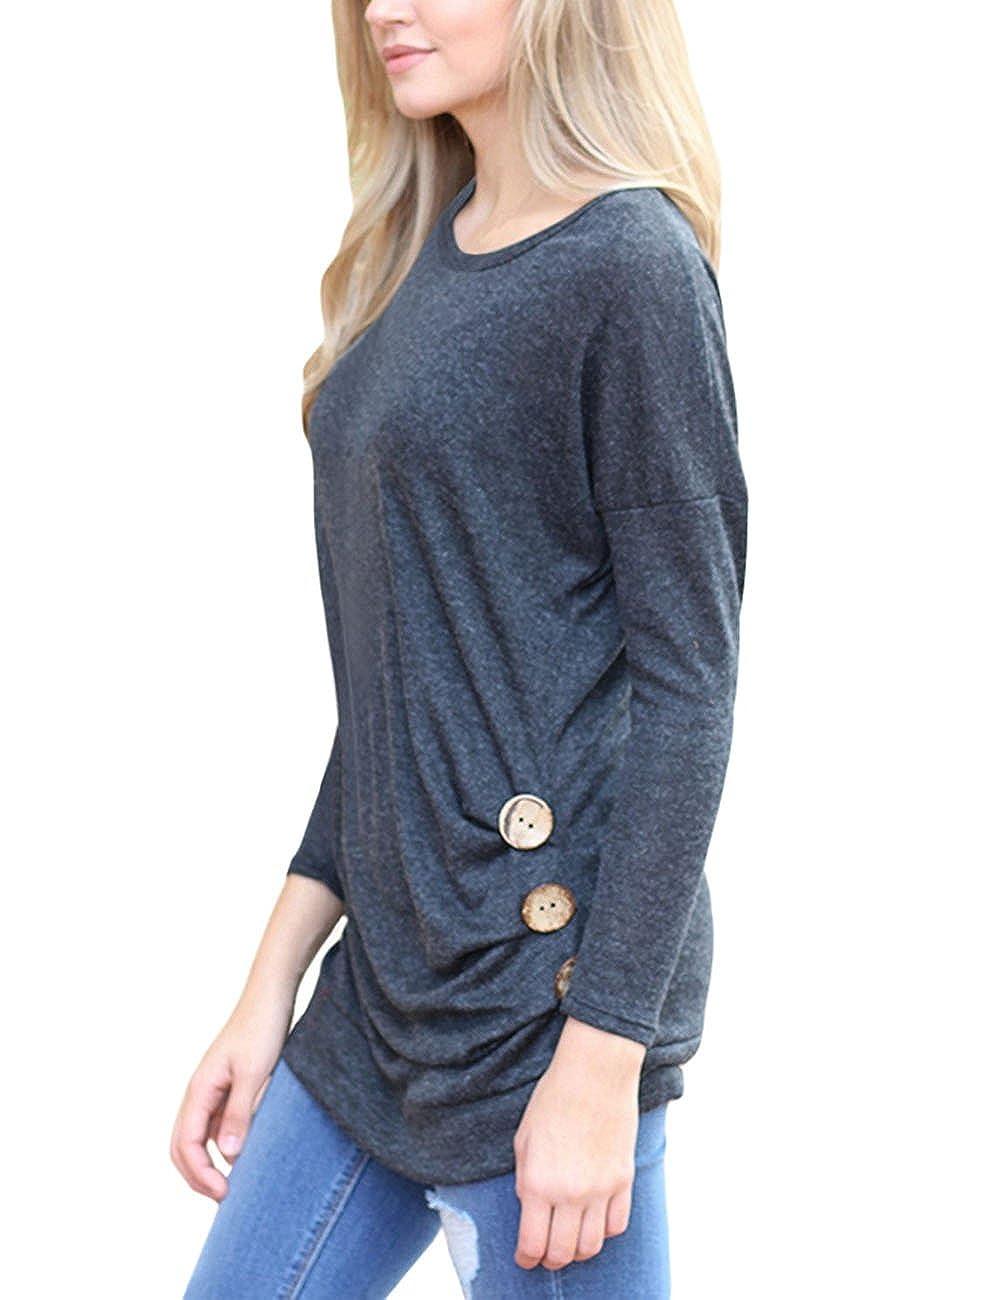 Yonala Womens Long Sleeve Casual Round Neck Button Top Blouse Tunic T Shirt 1553512091158